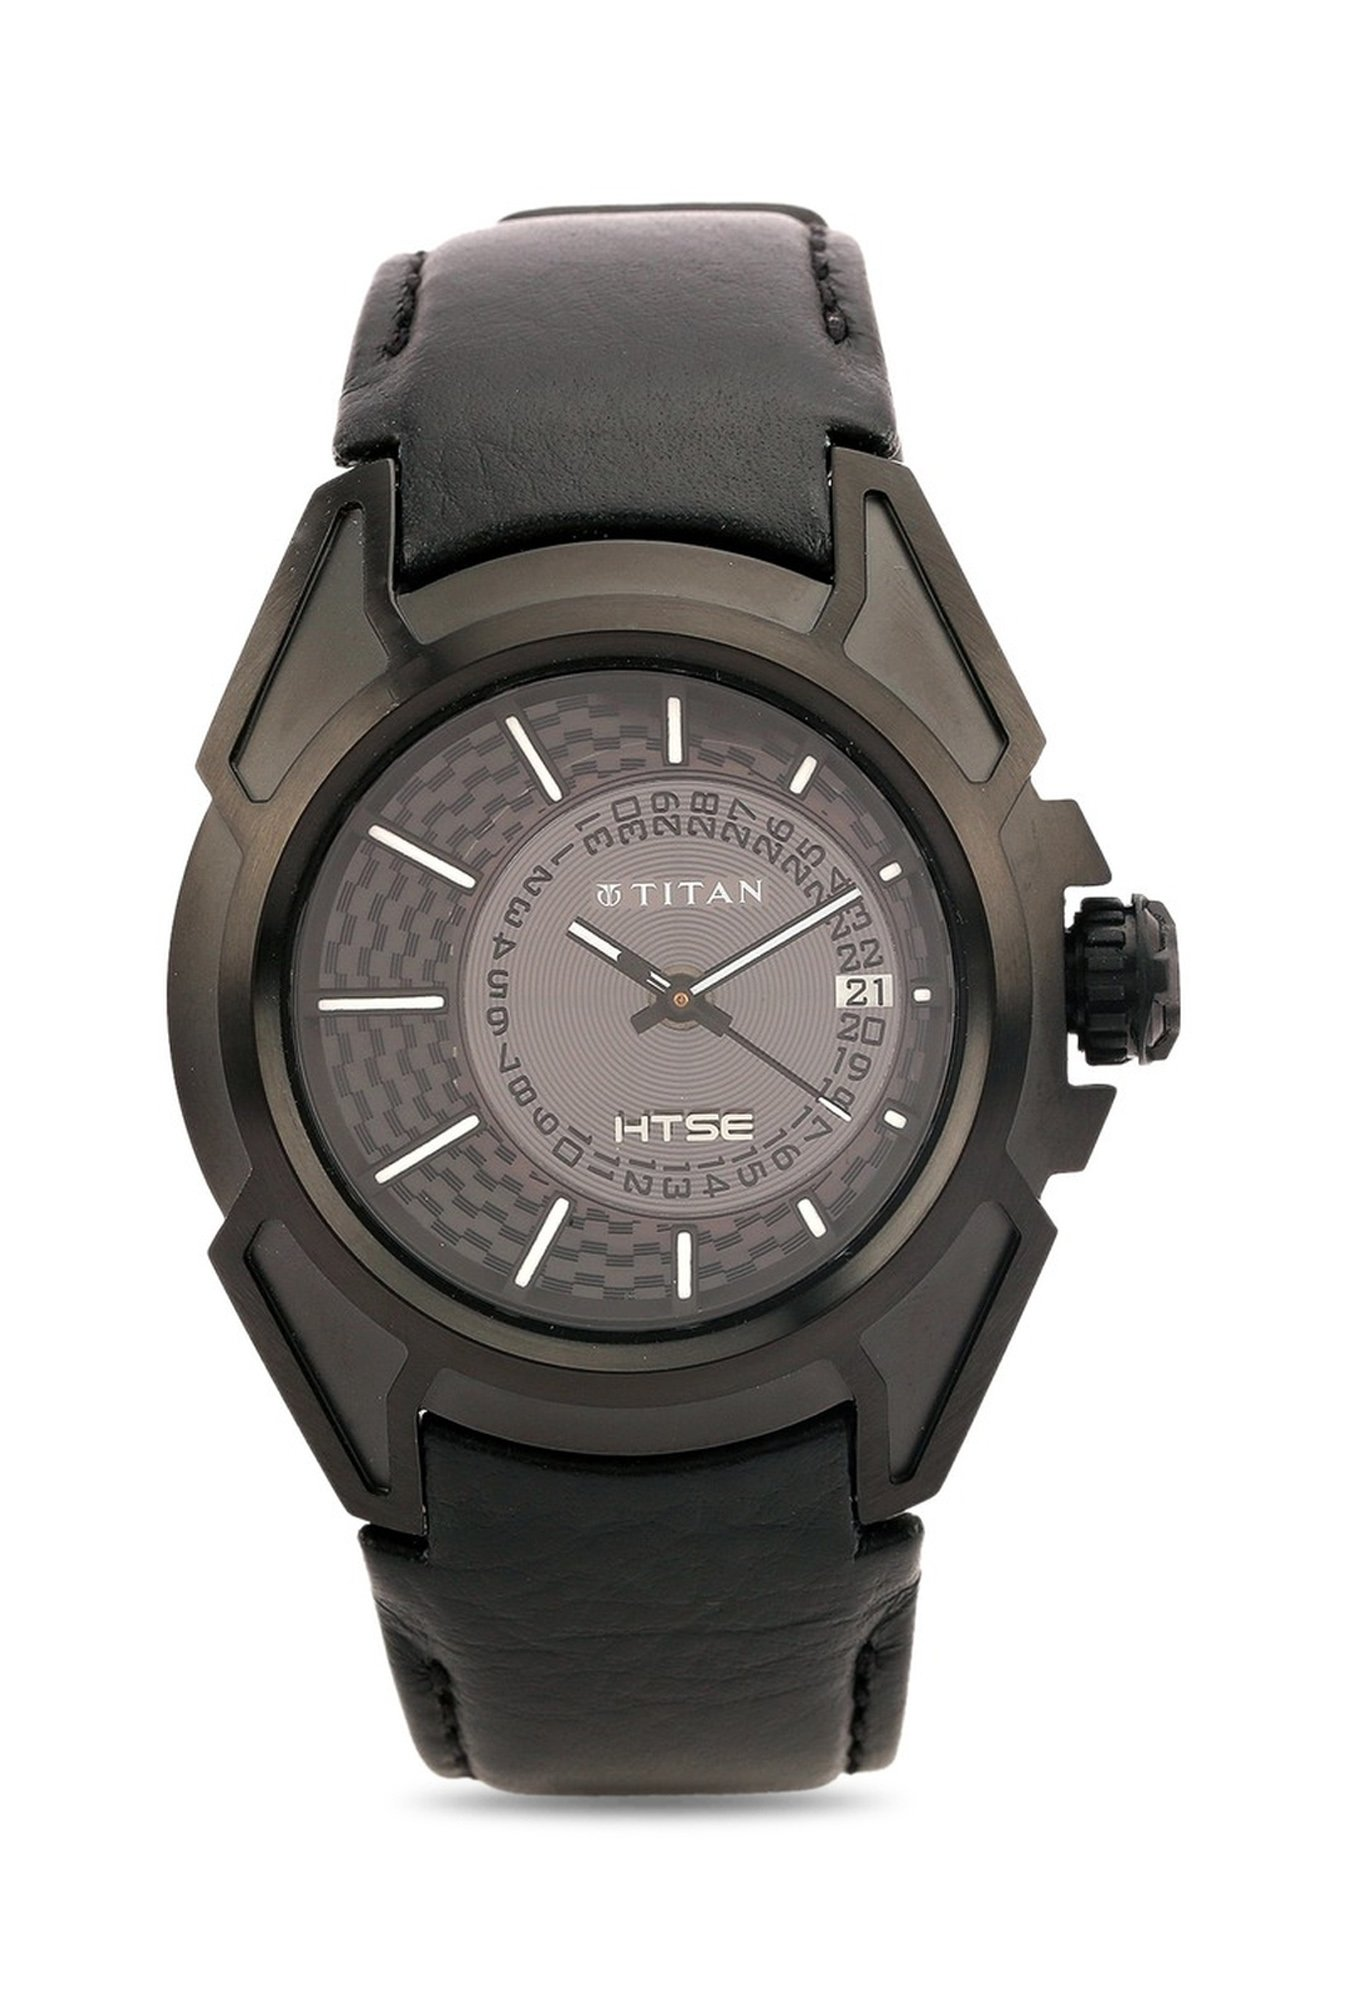 Titan NH1541NL01 HTSE Analog Watch for Men